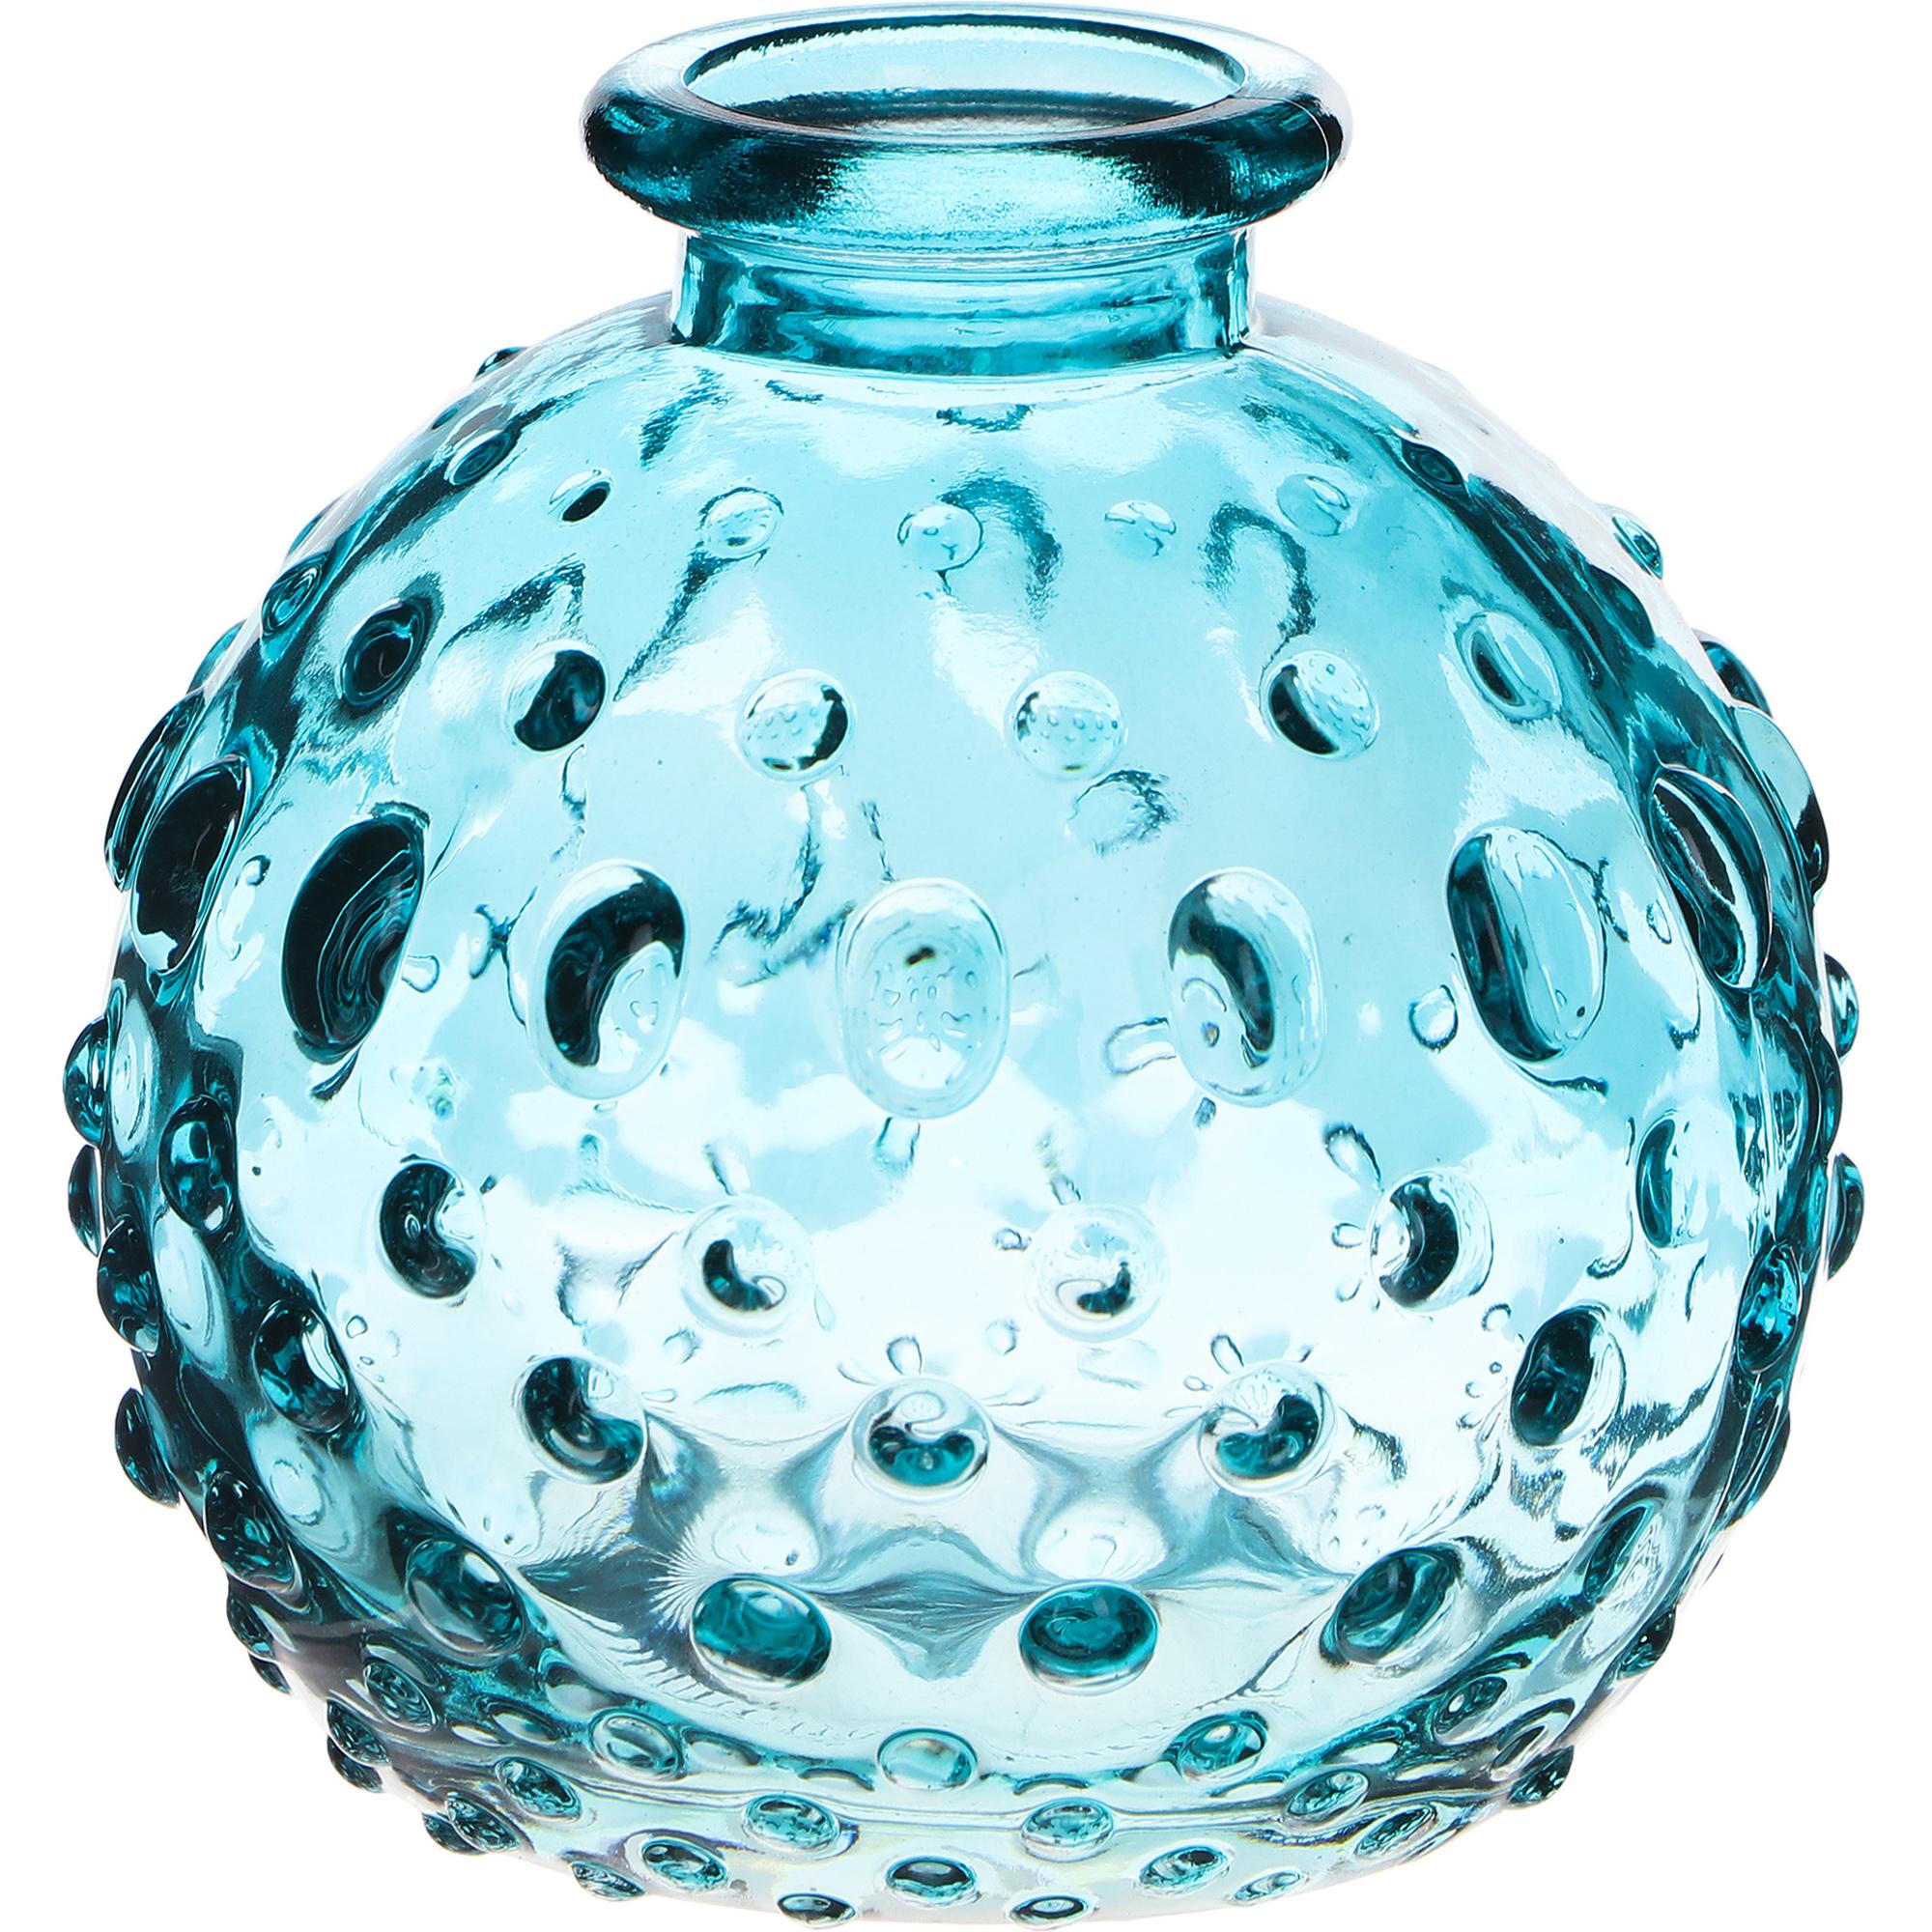 Ваза стеклянная Hakbijl Glass Mini Vase голубая 8,5х8 см